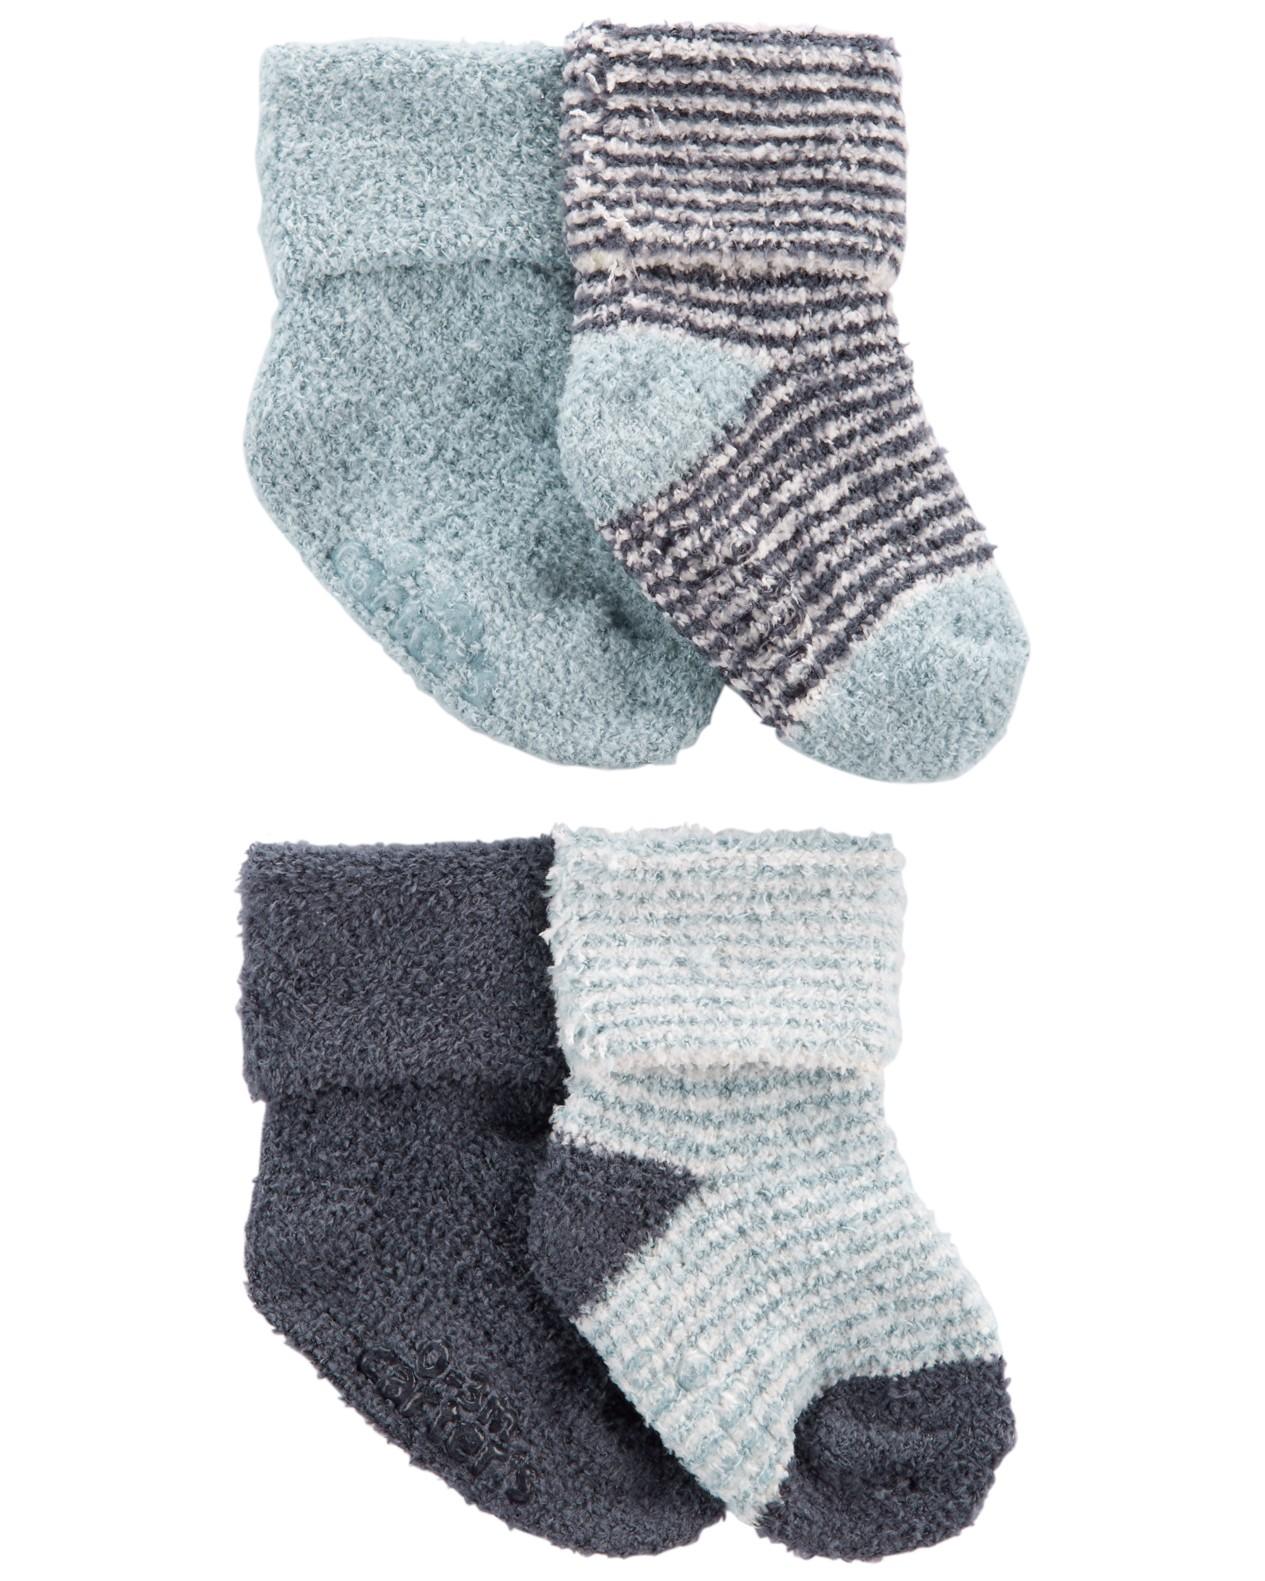 CARTER'S Ponožky Stripes Blue chlapec LBB 4ks 3-12m